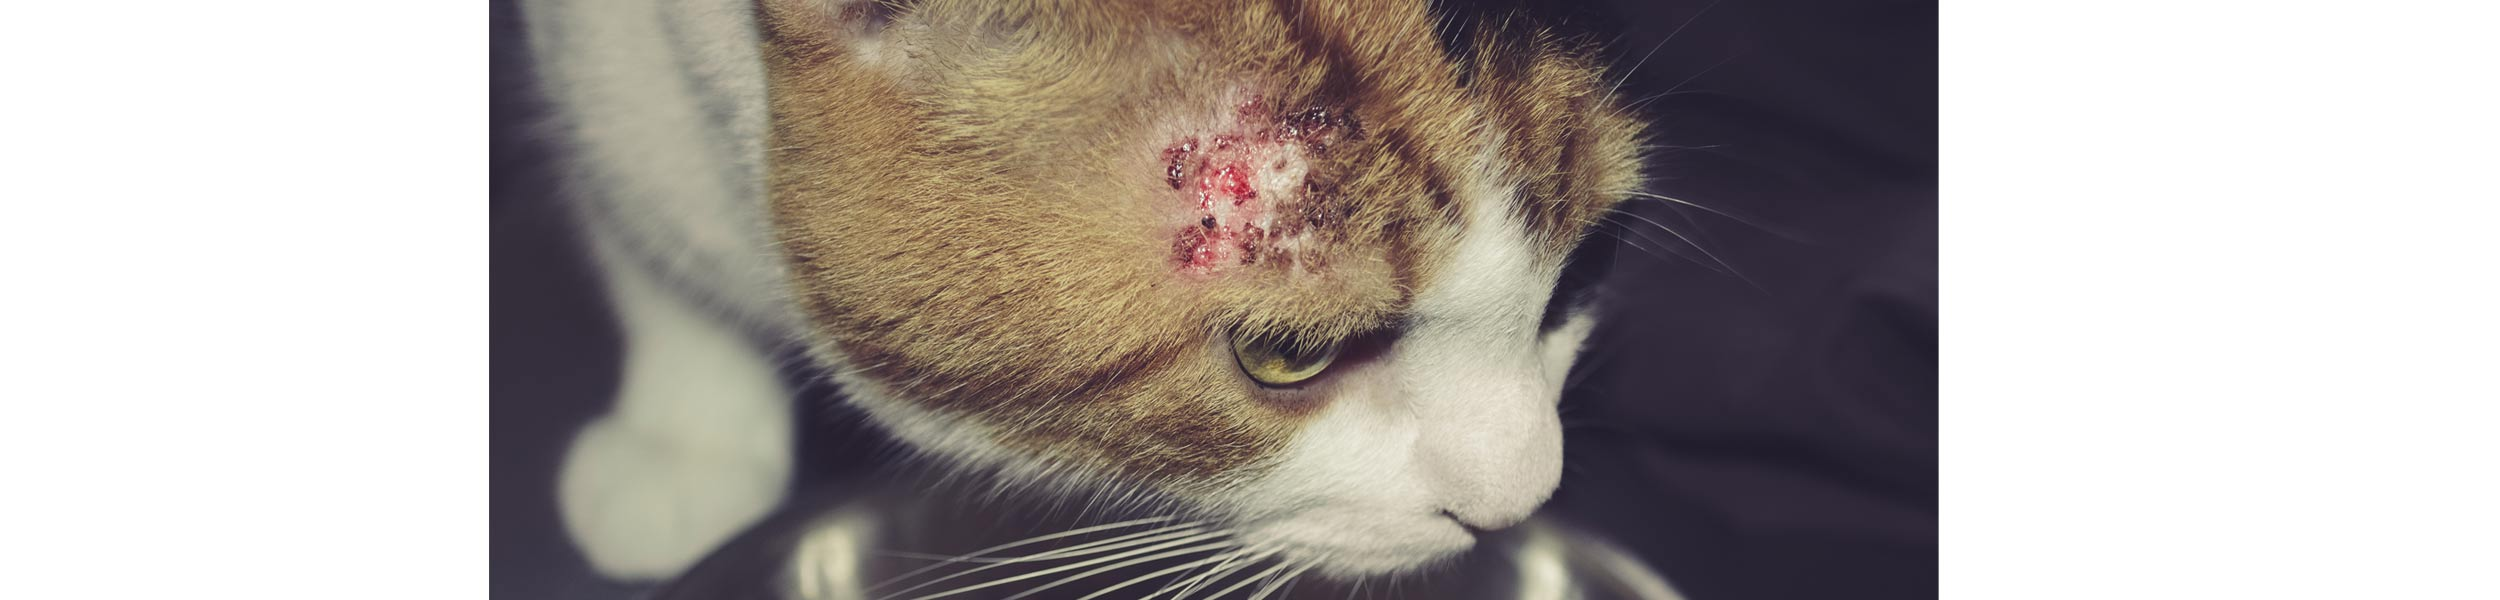 ACE Exterminating-Pest-Services-Fleas-Cat-Skin-Damage-Header